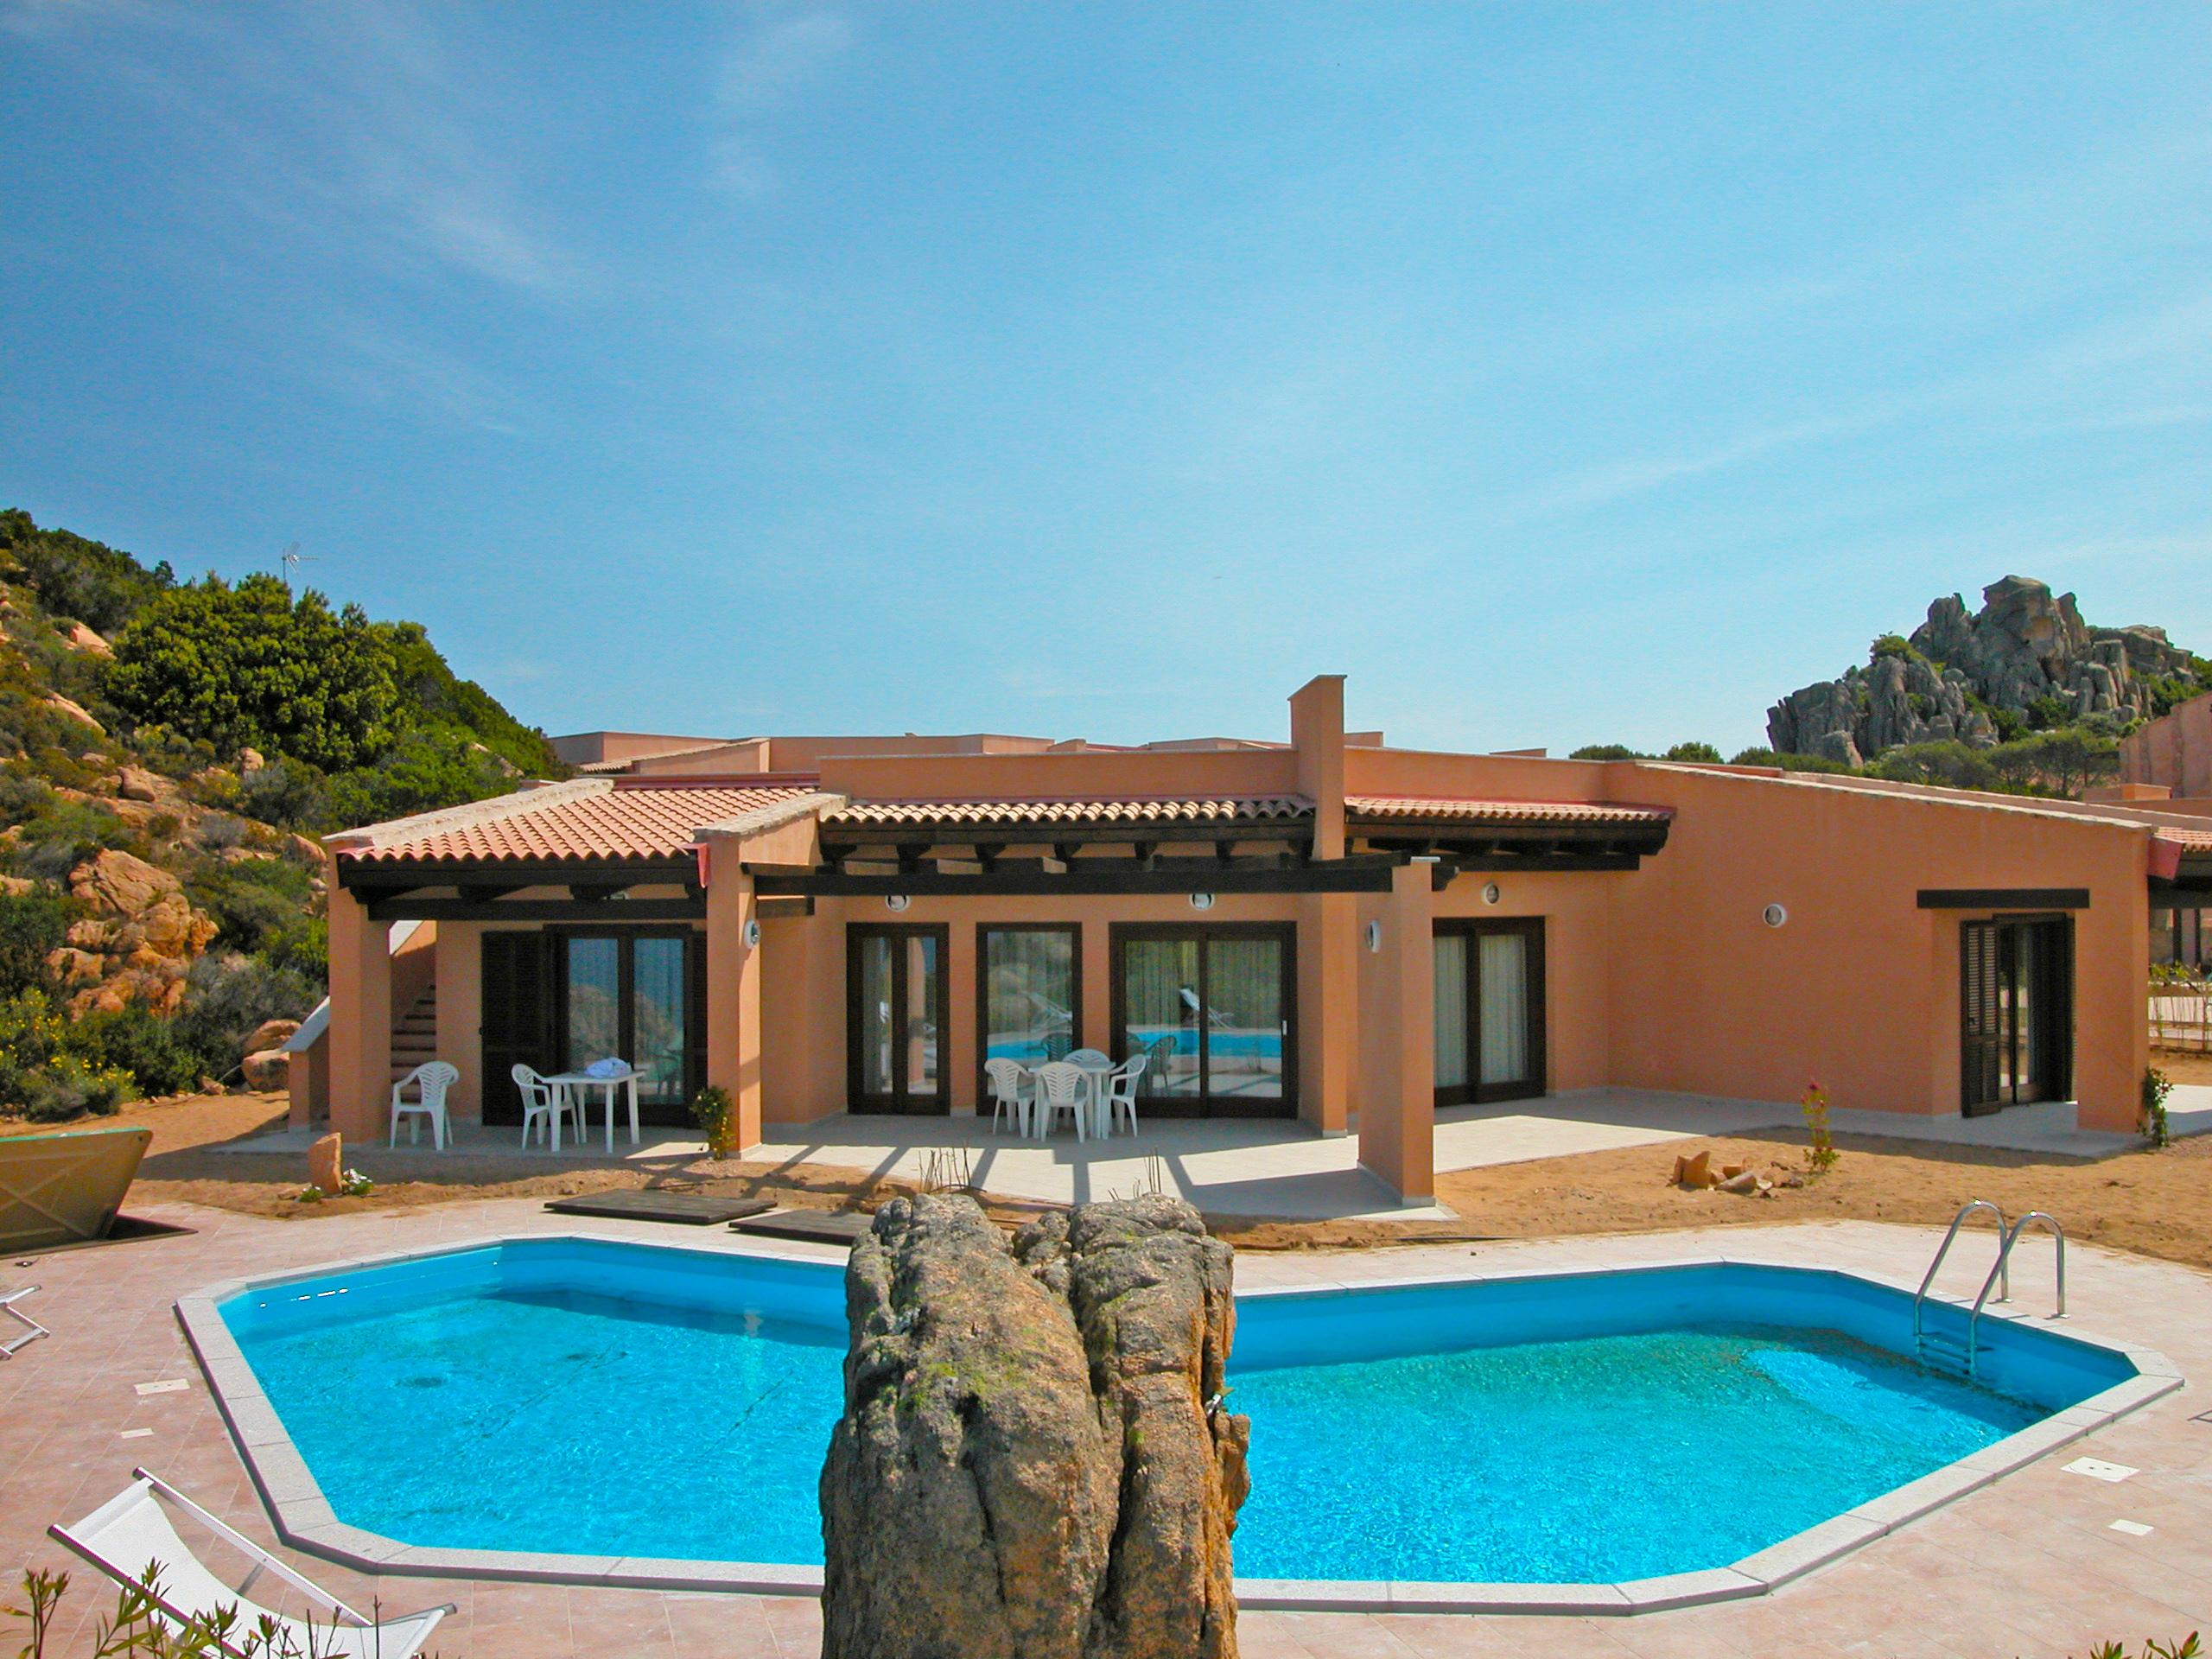 ferienhaus sette in costa paradiso italien it70353751